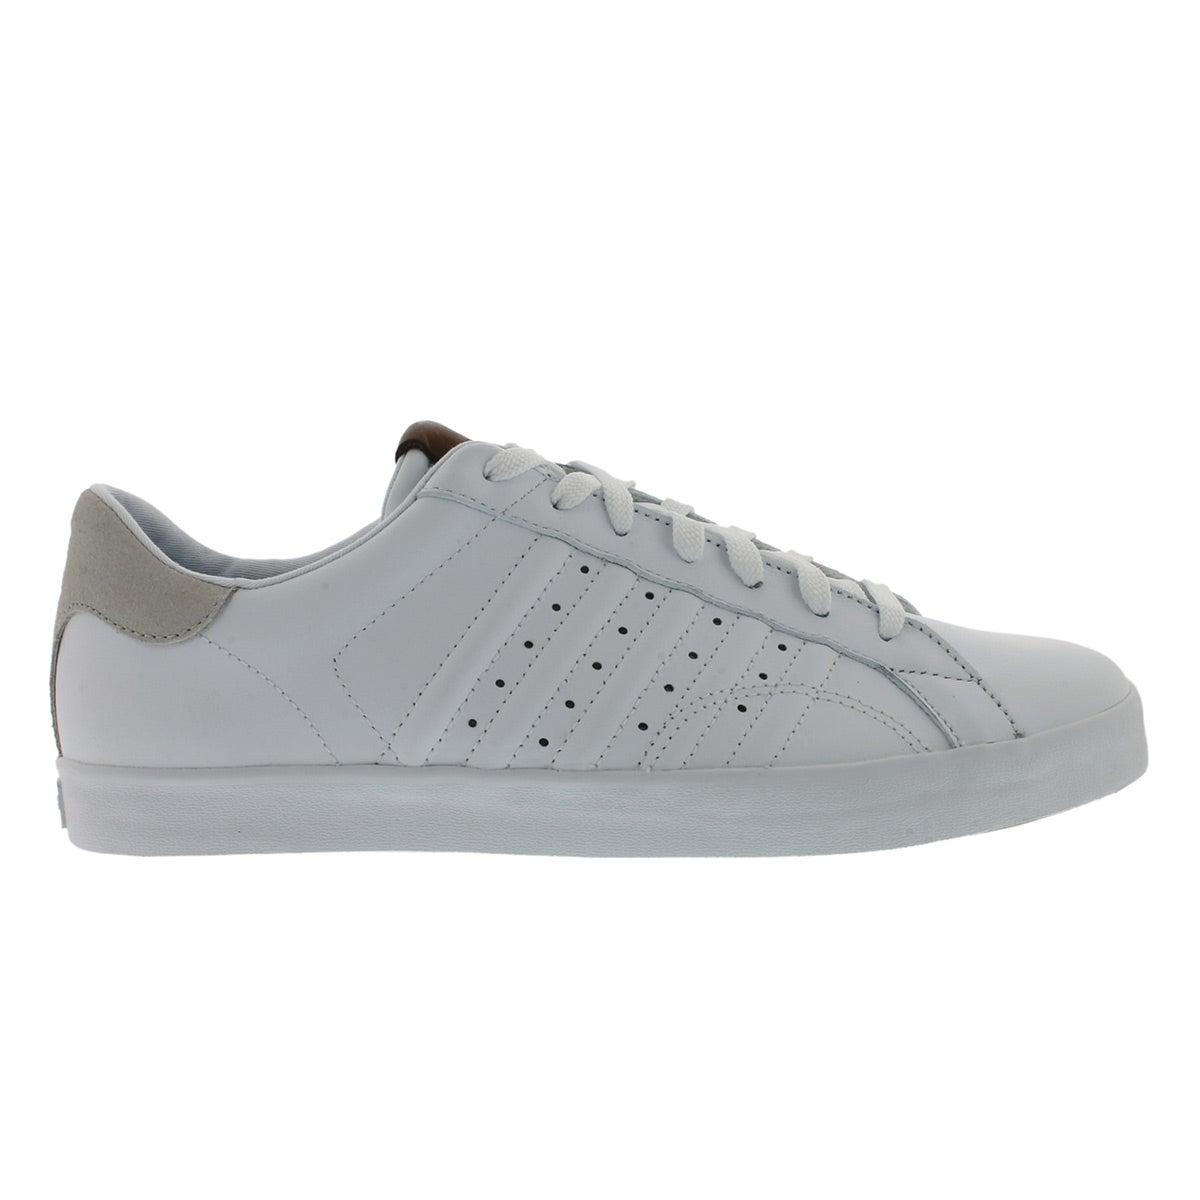 Mns Belmont Premium white sneaker